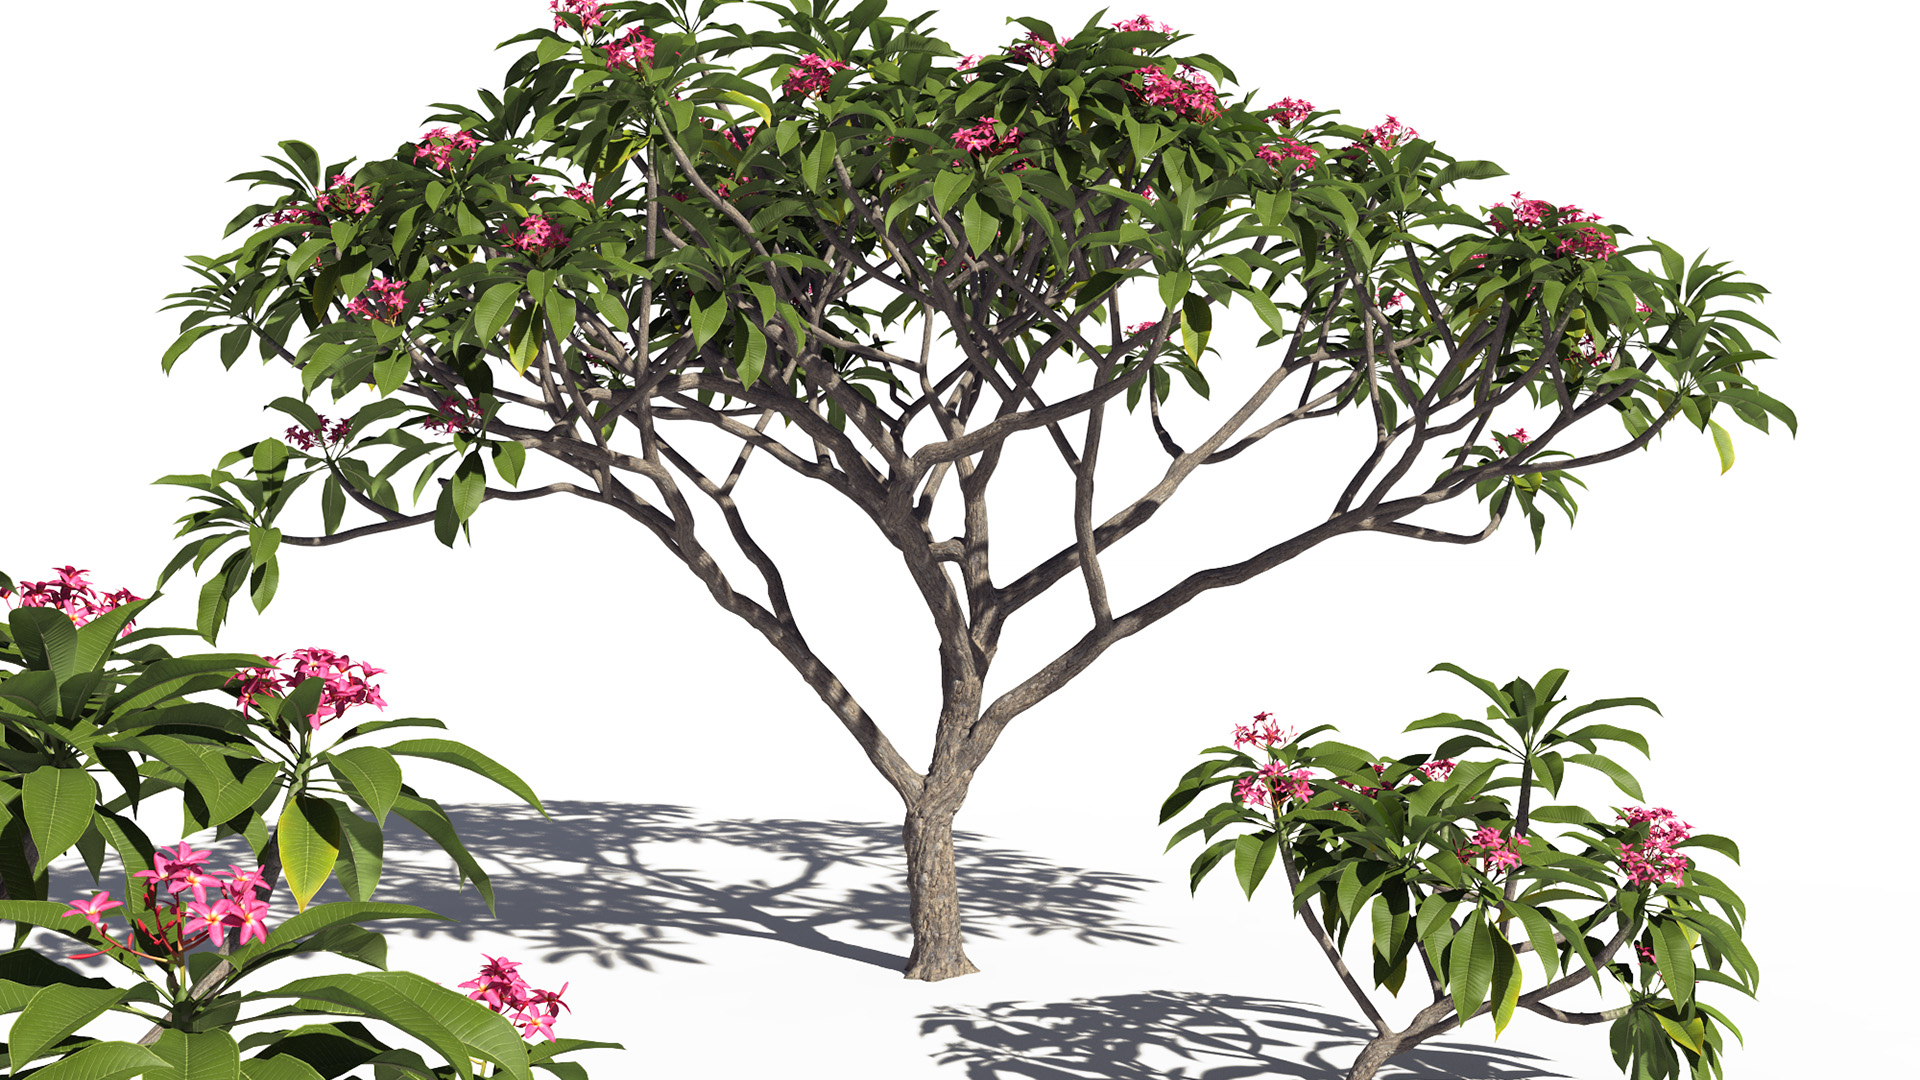 3D model of the Frangipani tree Plumeria rubra pink